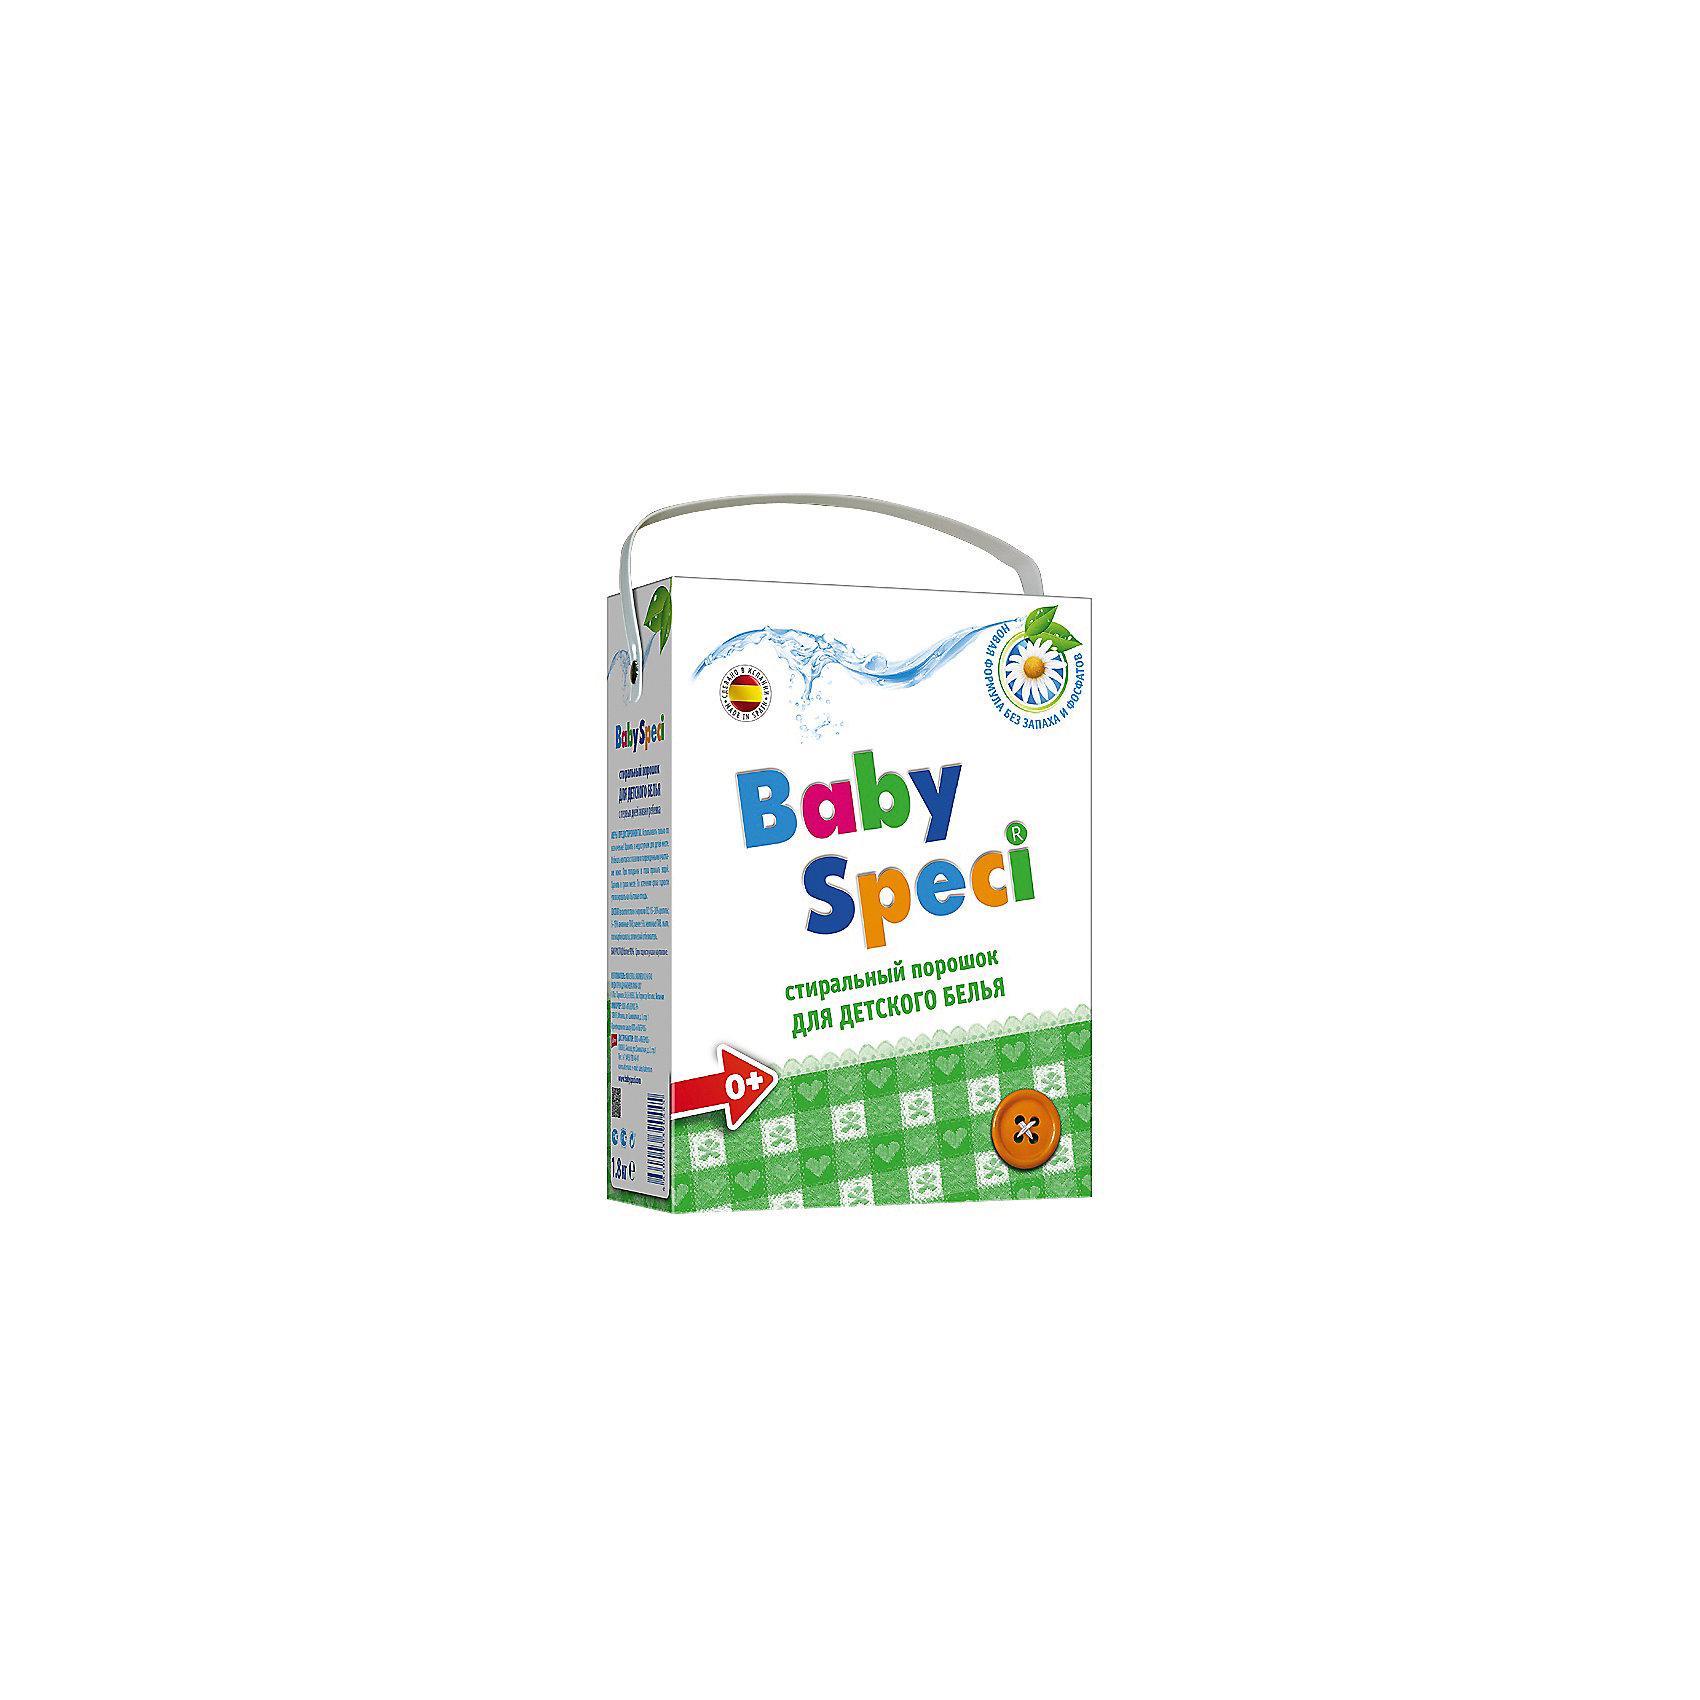 Baby Speci Стиральный порошок 1800 гр., Baby Speci стиральный порошок topperr 3205 active